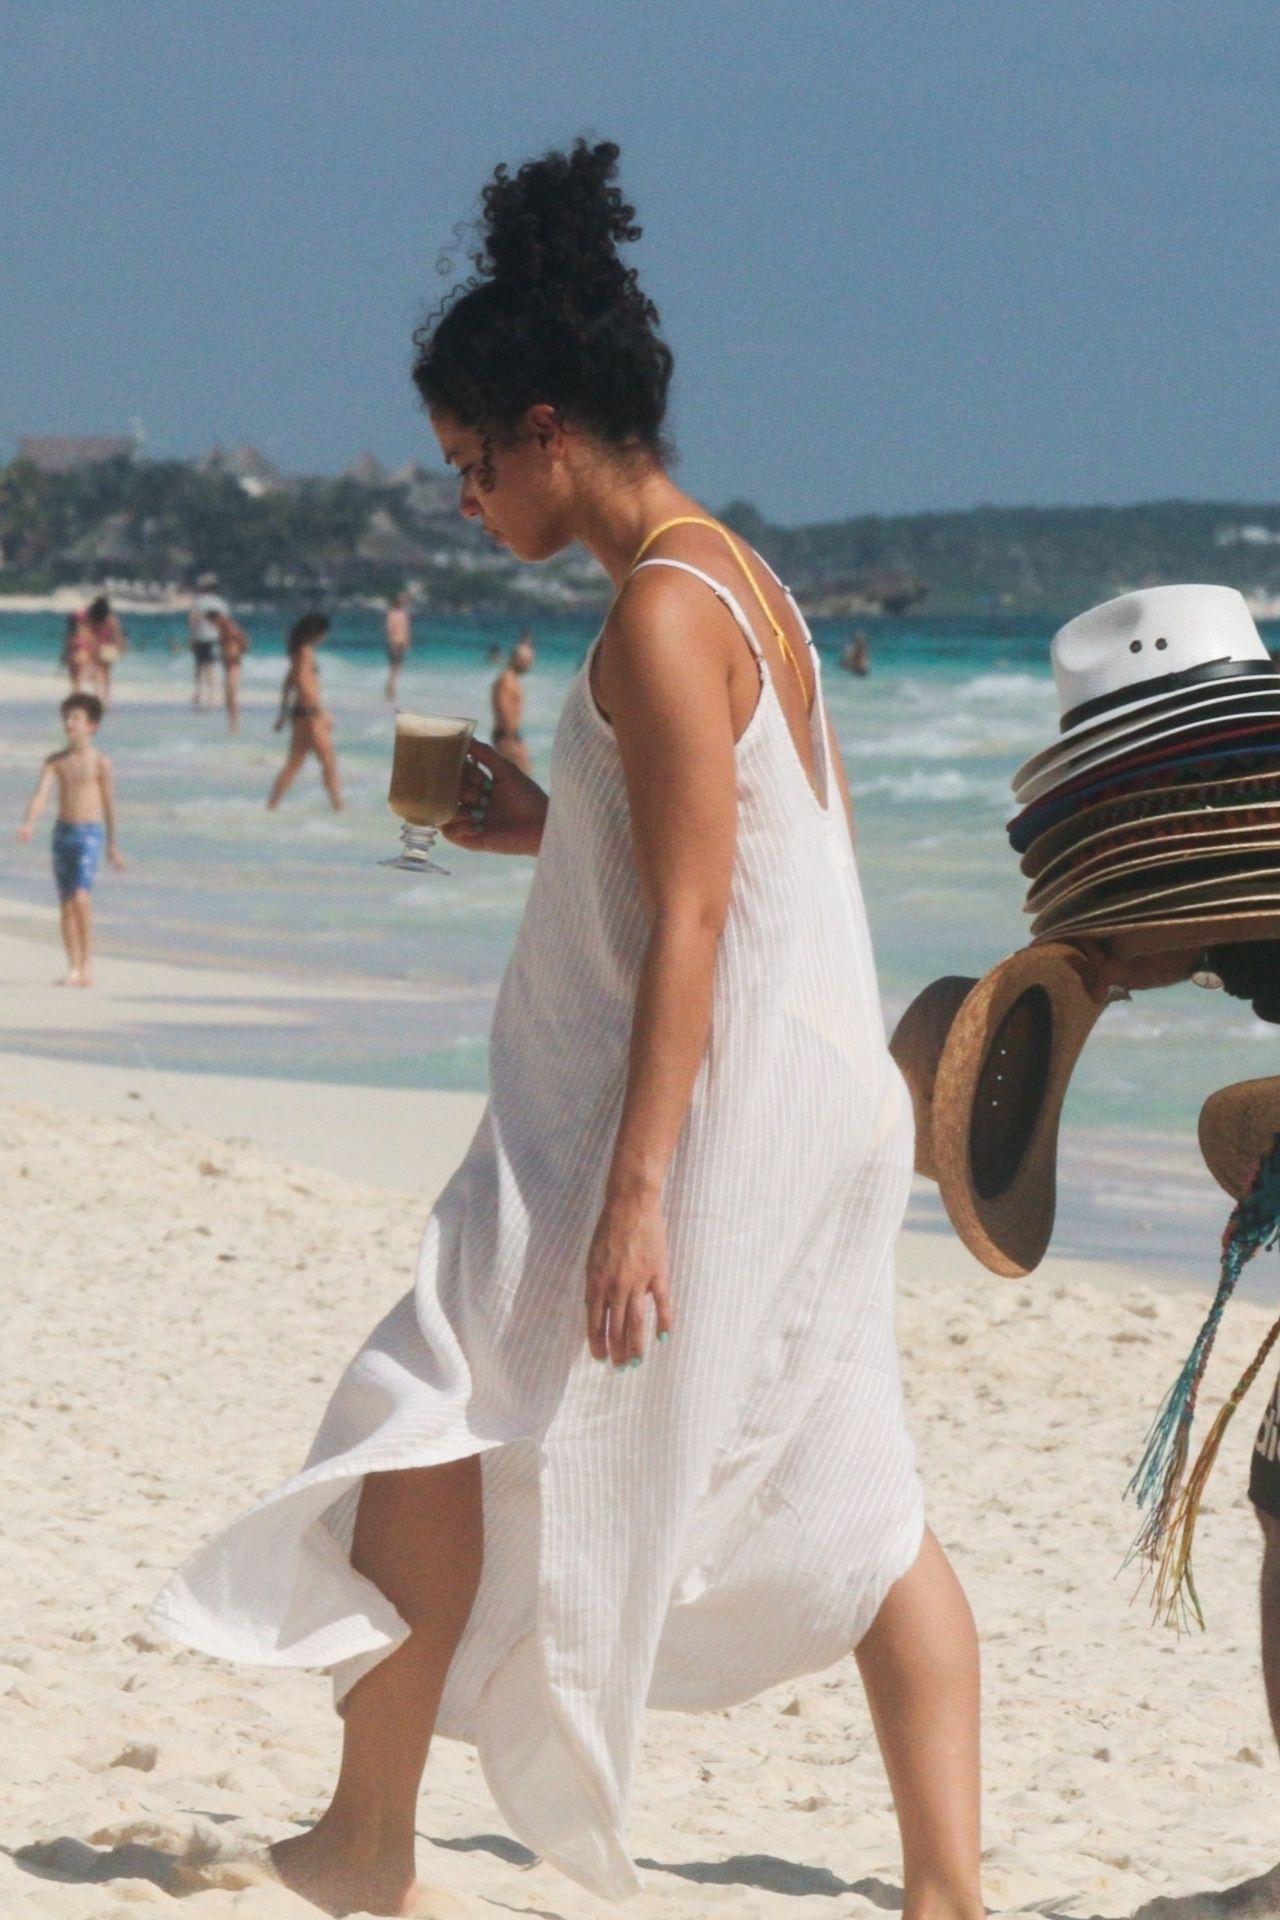 Alisha Wainwright Enjoys A Sun Filled Getaway In Tulum 0095